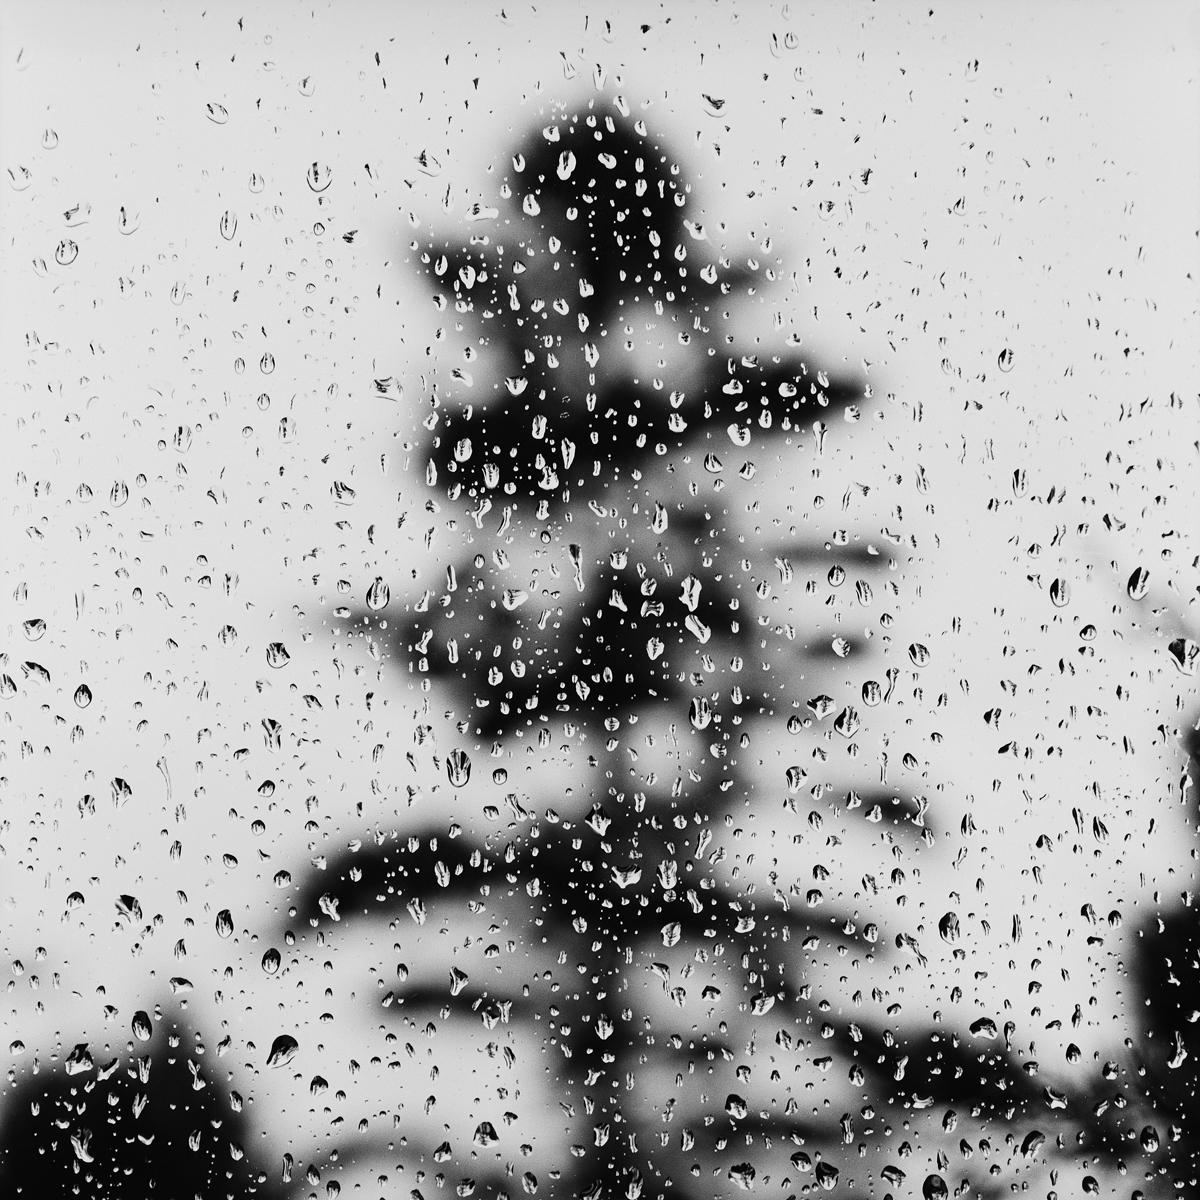 28. Raindrops and White Pine Tree, Valcour, NY. 1999. Toned Gelatin Silver Print.